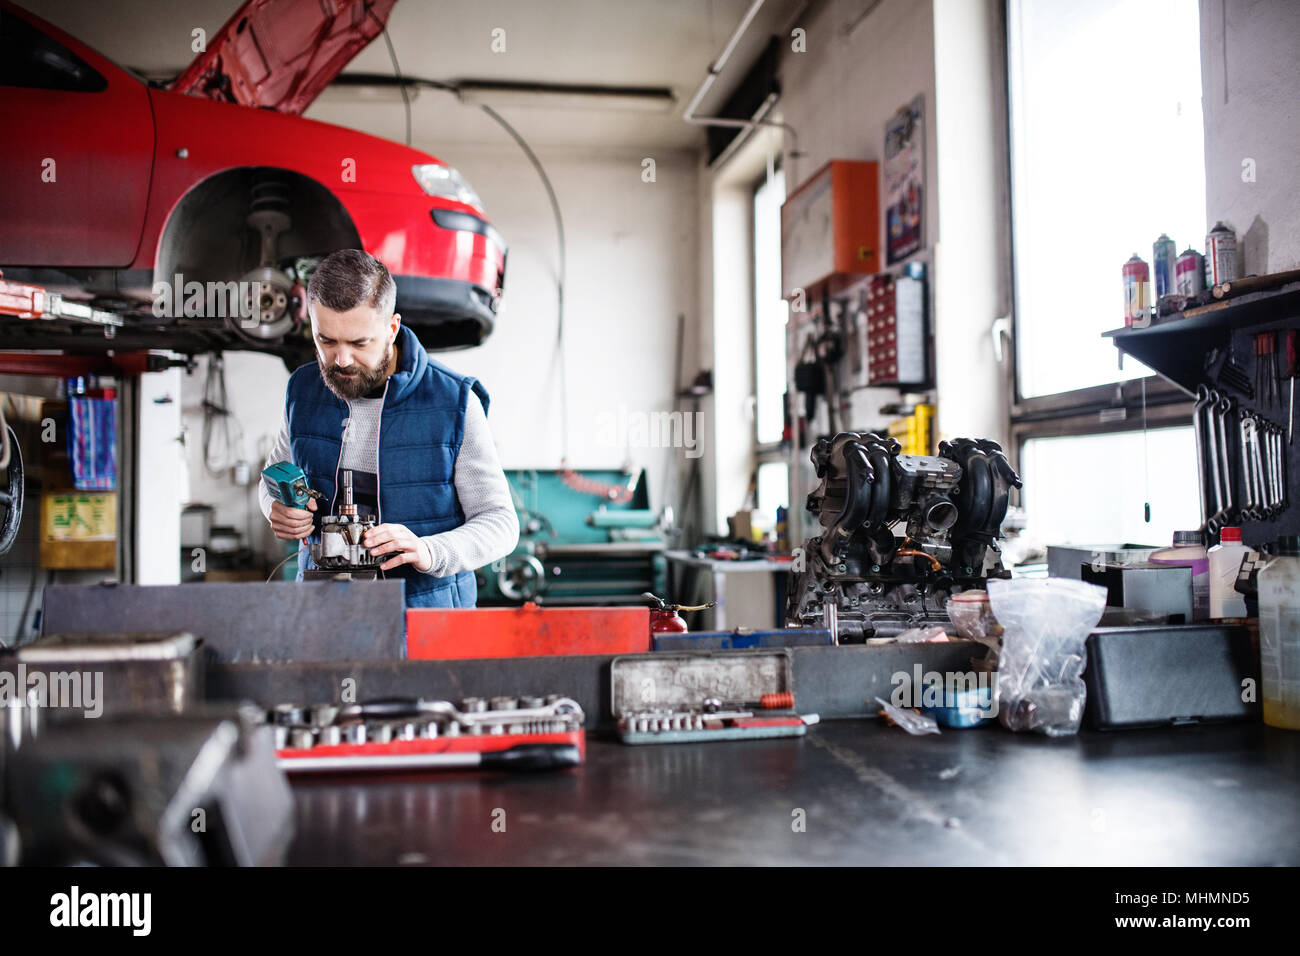 Man mechanic repairing a car in a garage. - Stock Image